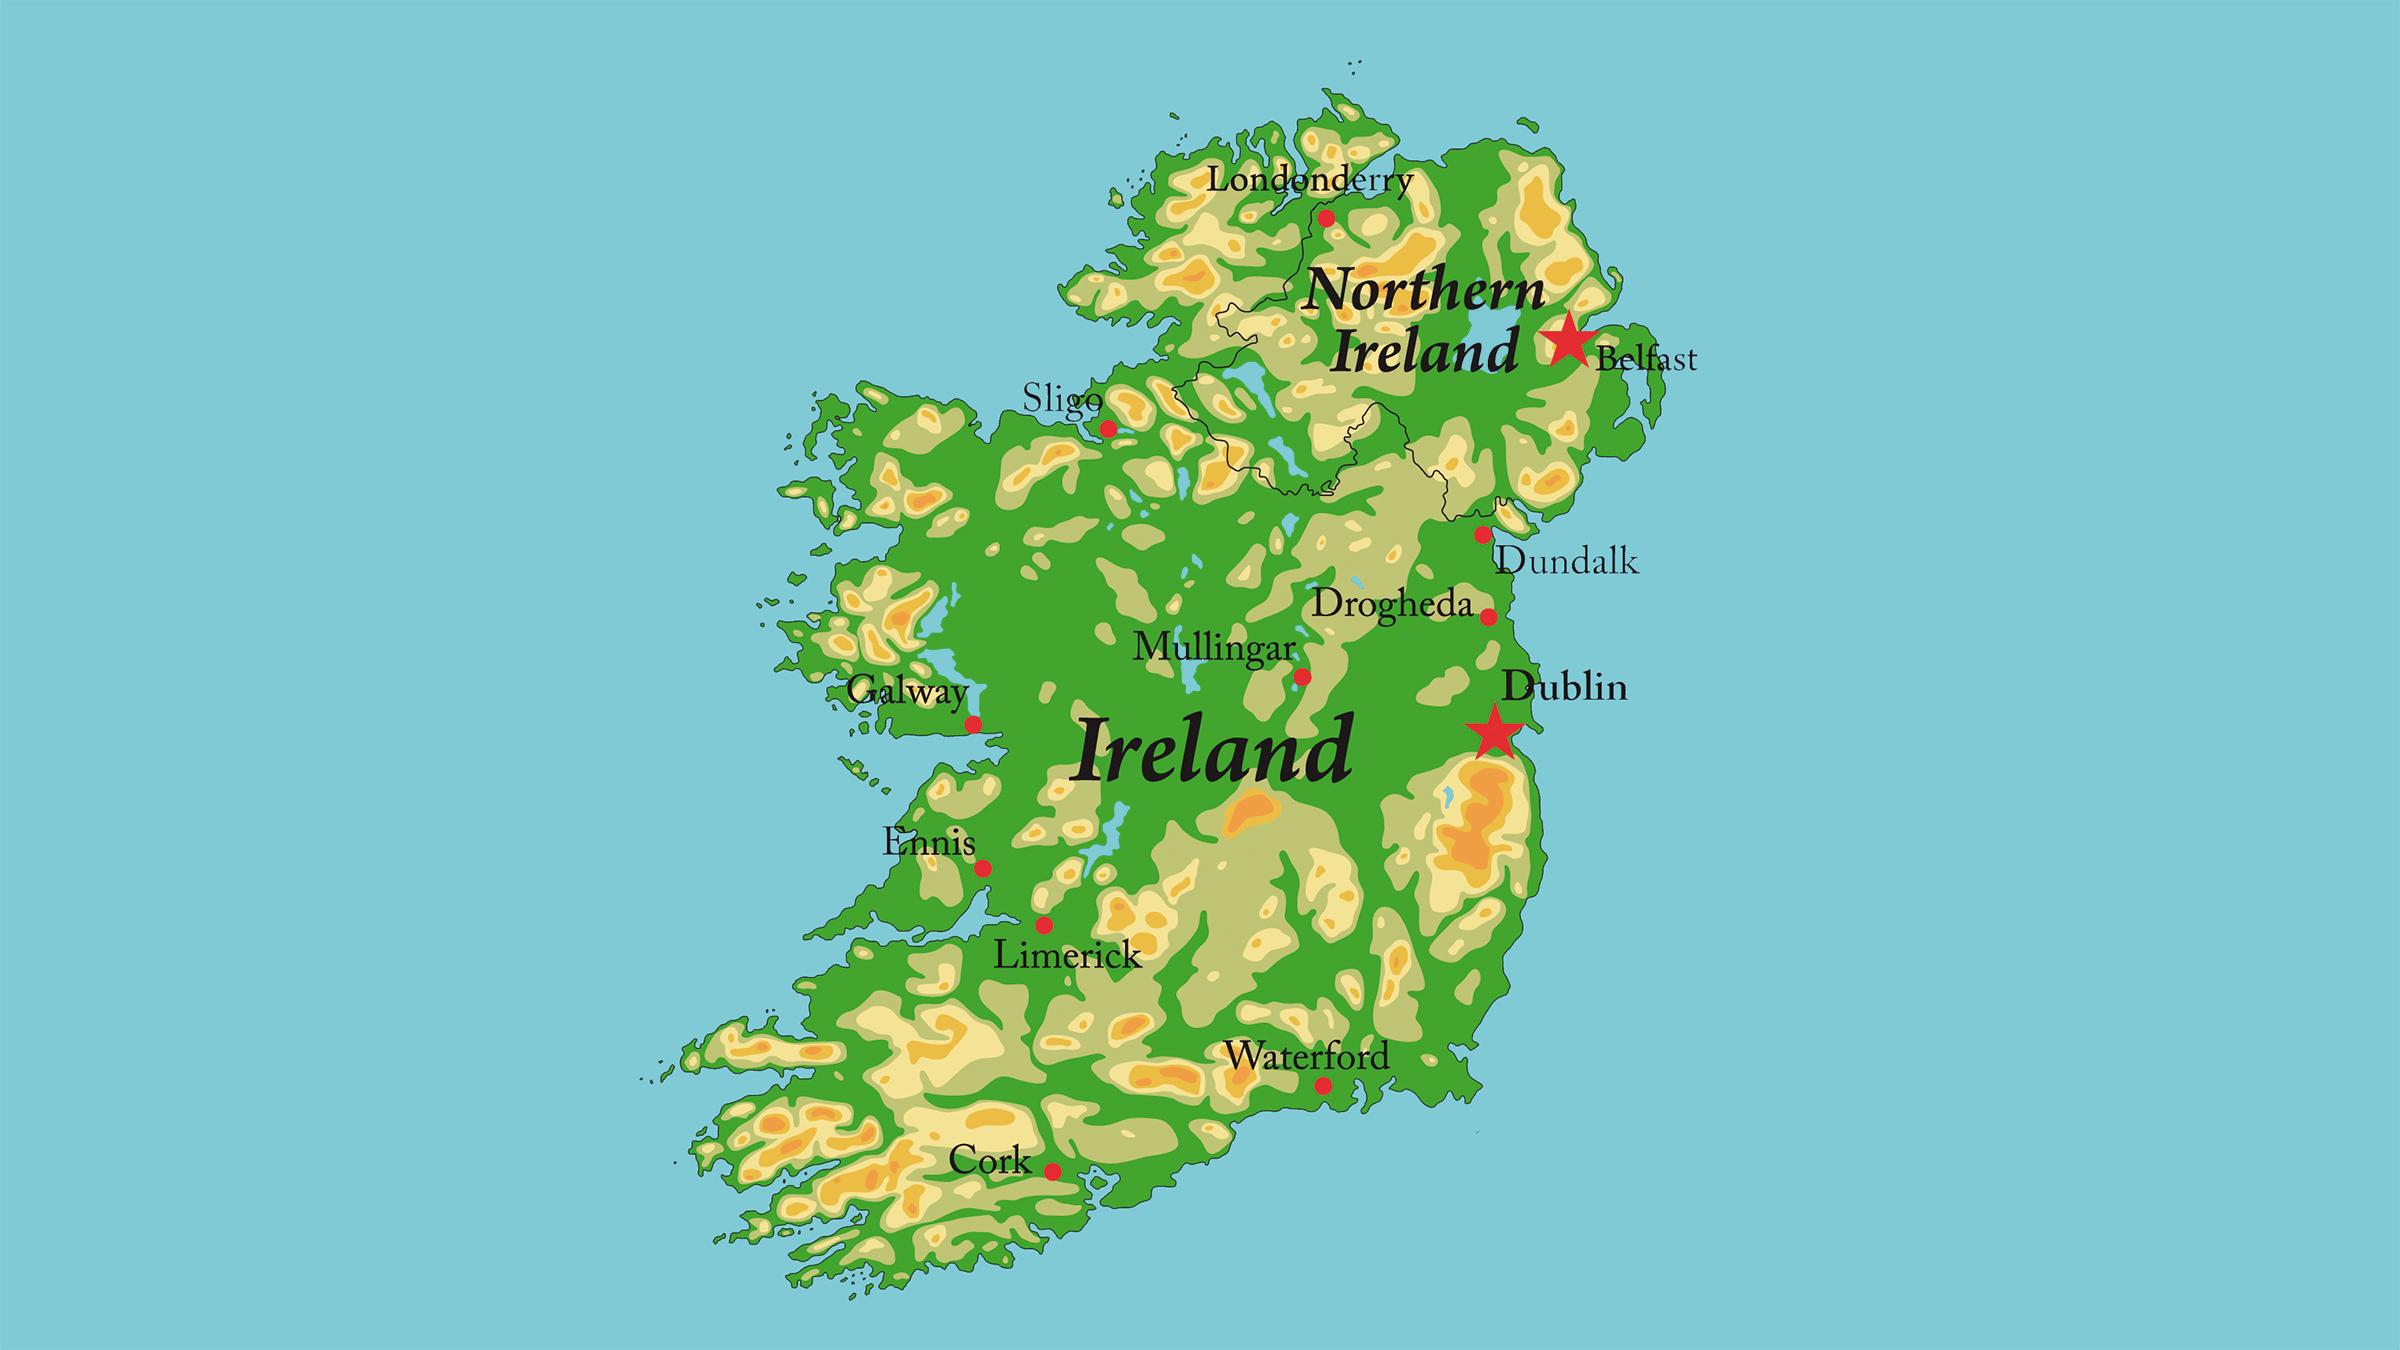 трав, которых ирландия на карте мира фото украшен